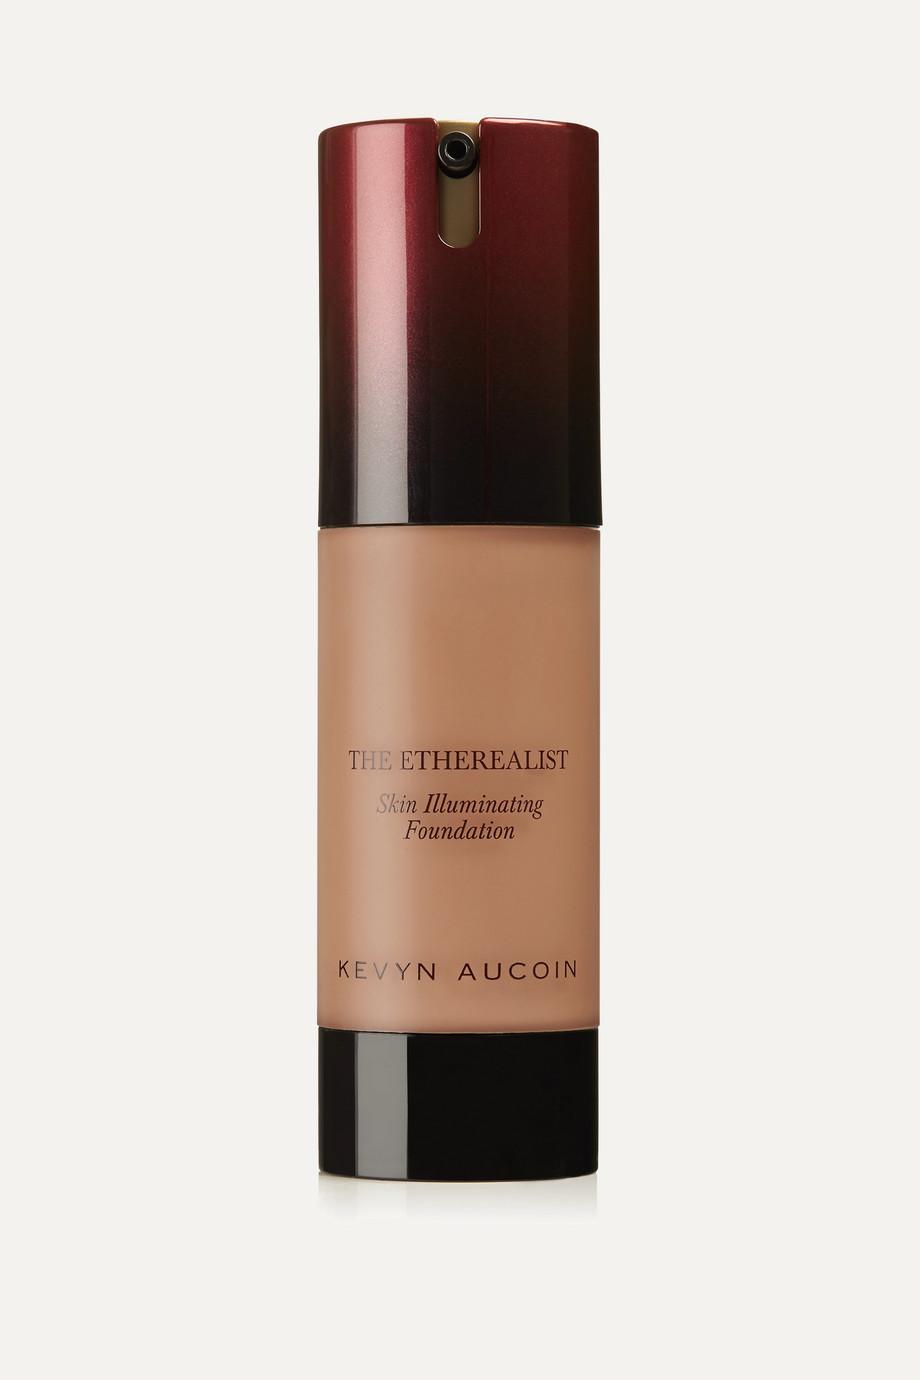 Kevyn Aucoin Fond de teint illuminateur The Etherealist, Medium EF 10, 28 ml